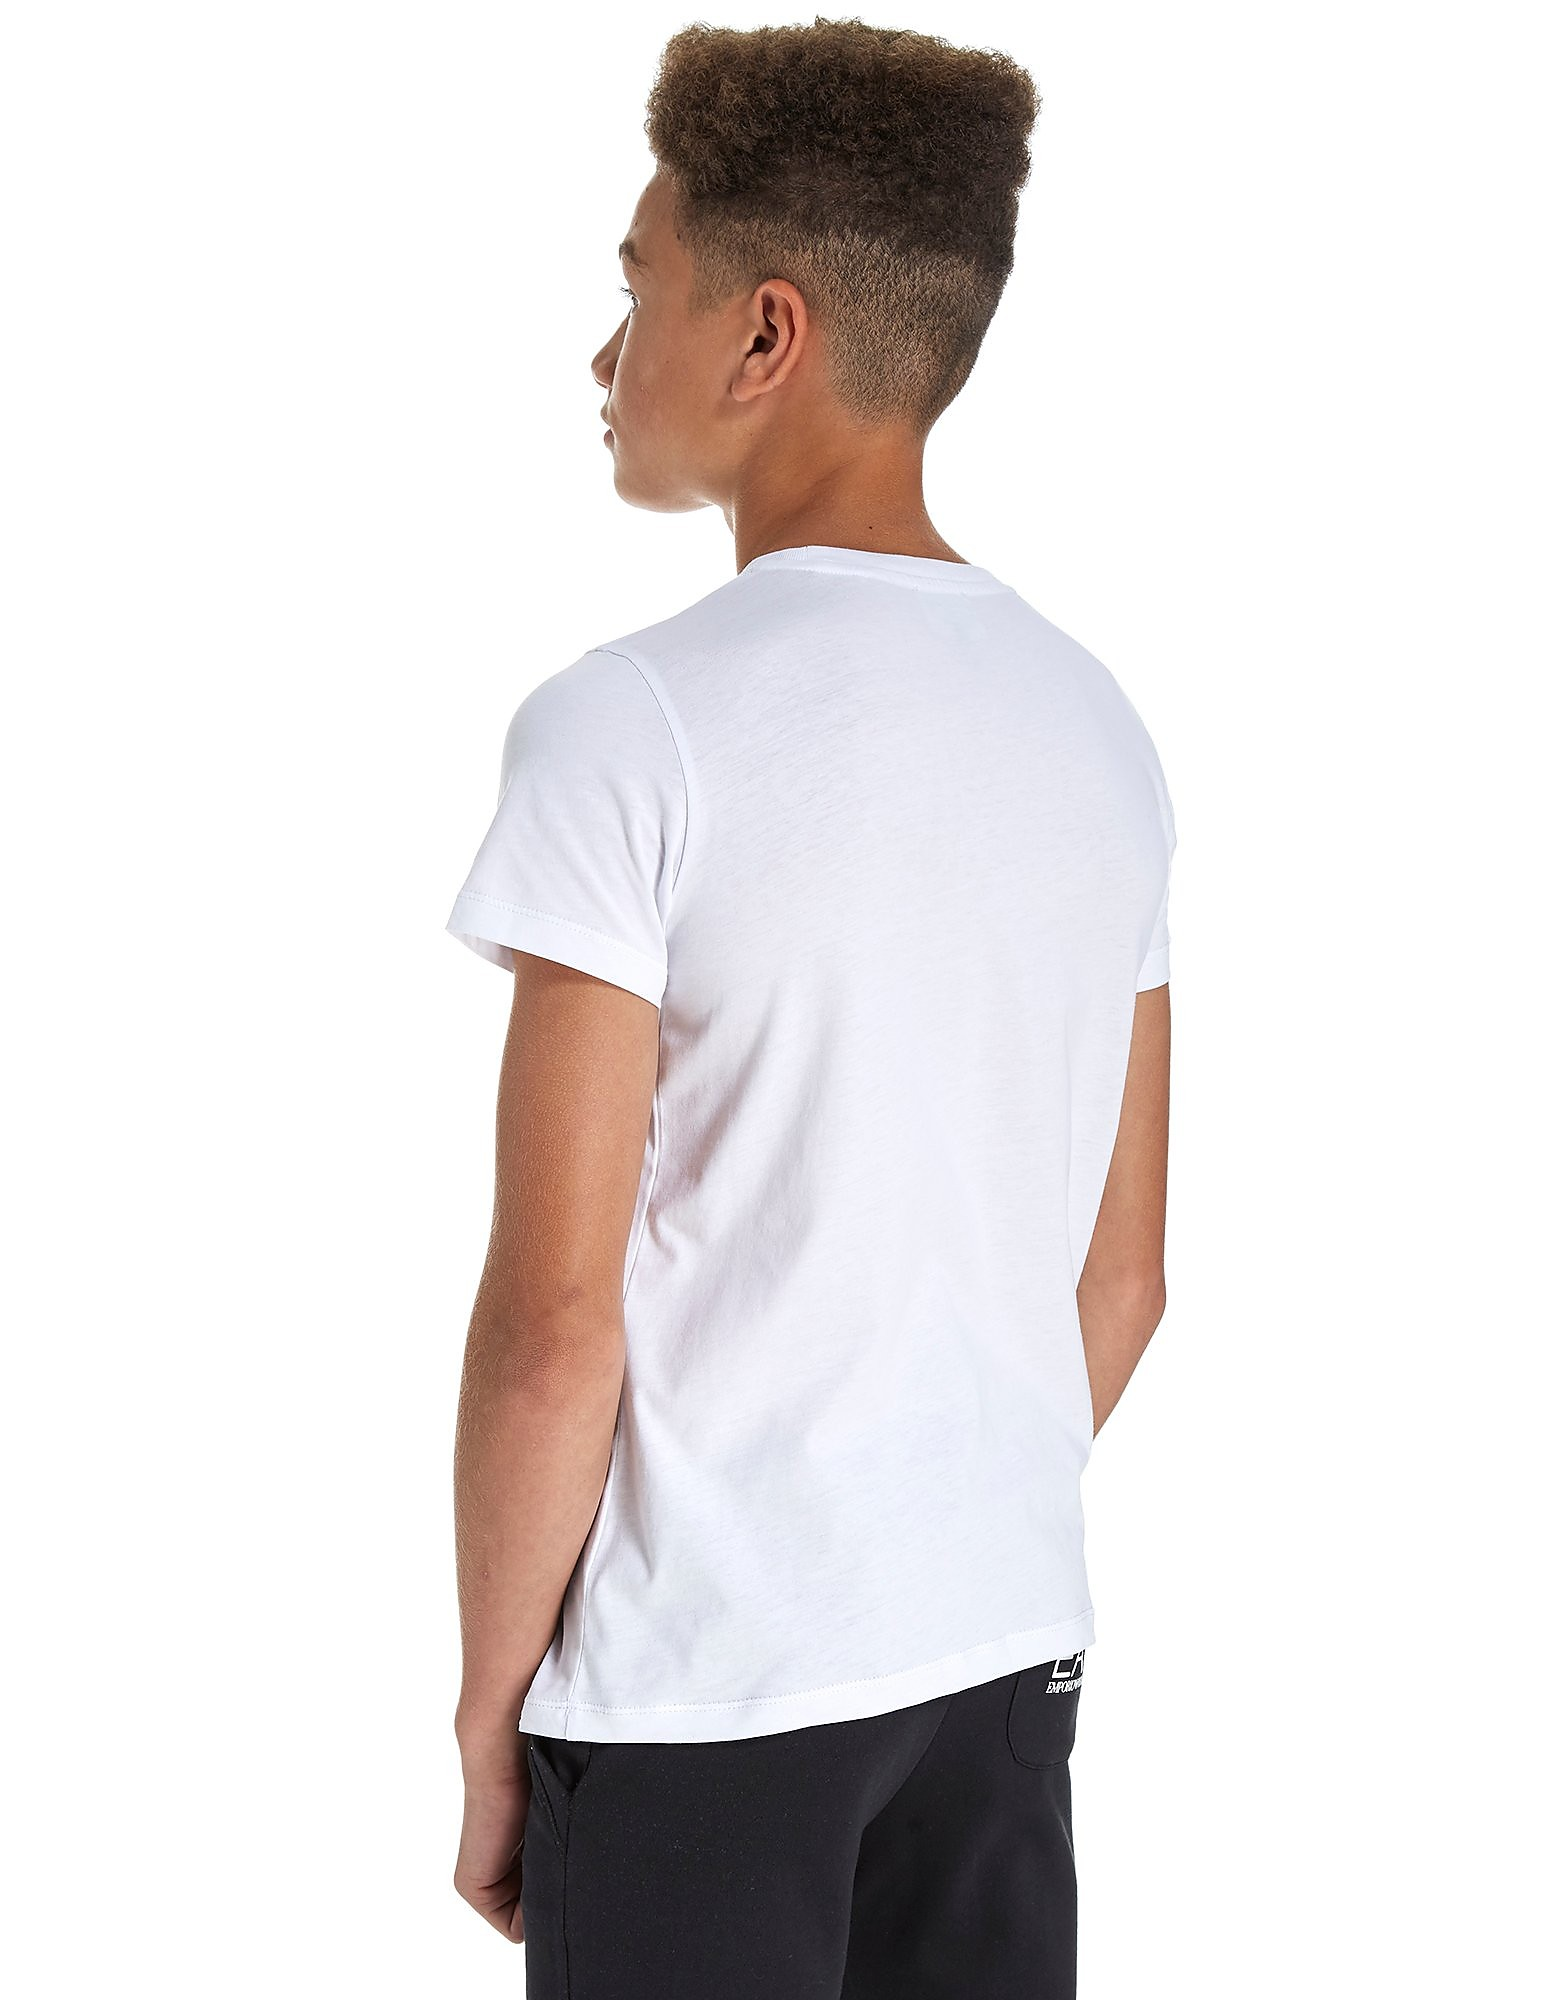 Emporio Armani EA7 Core Short Sleeve T-Shirt Junior